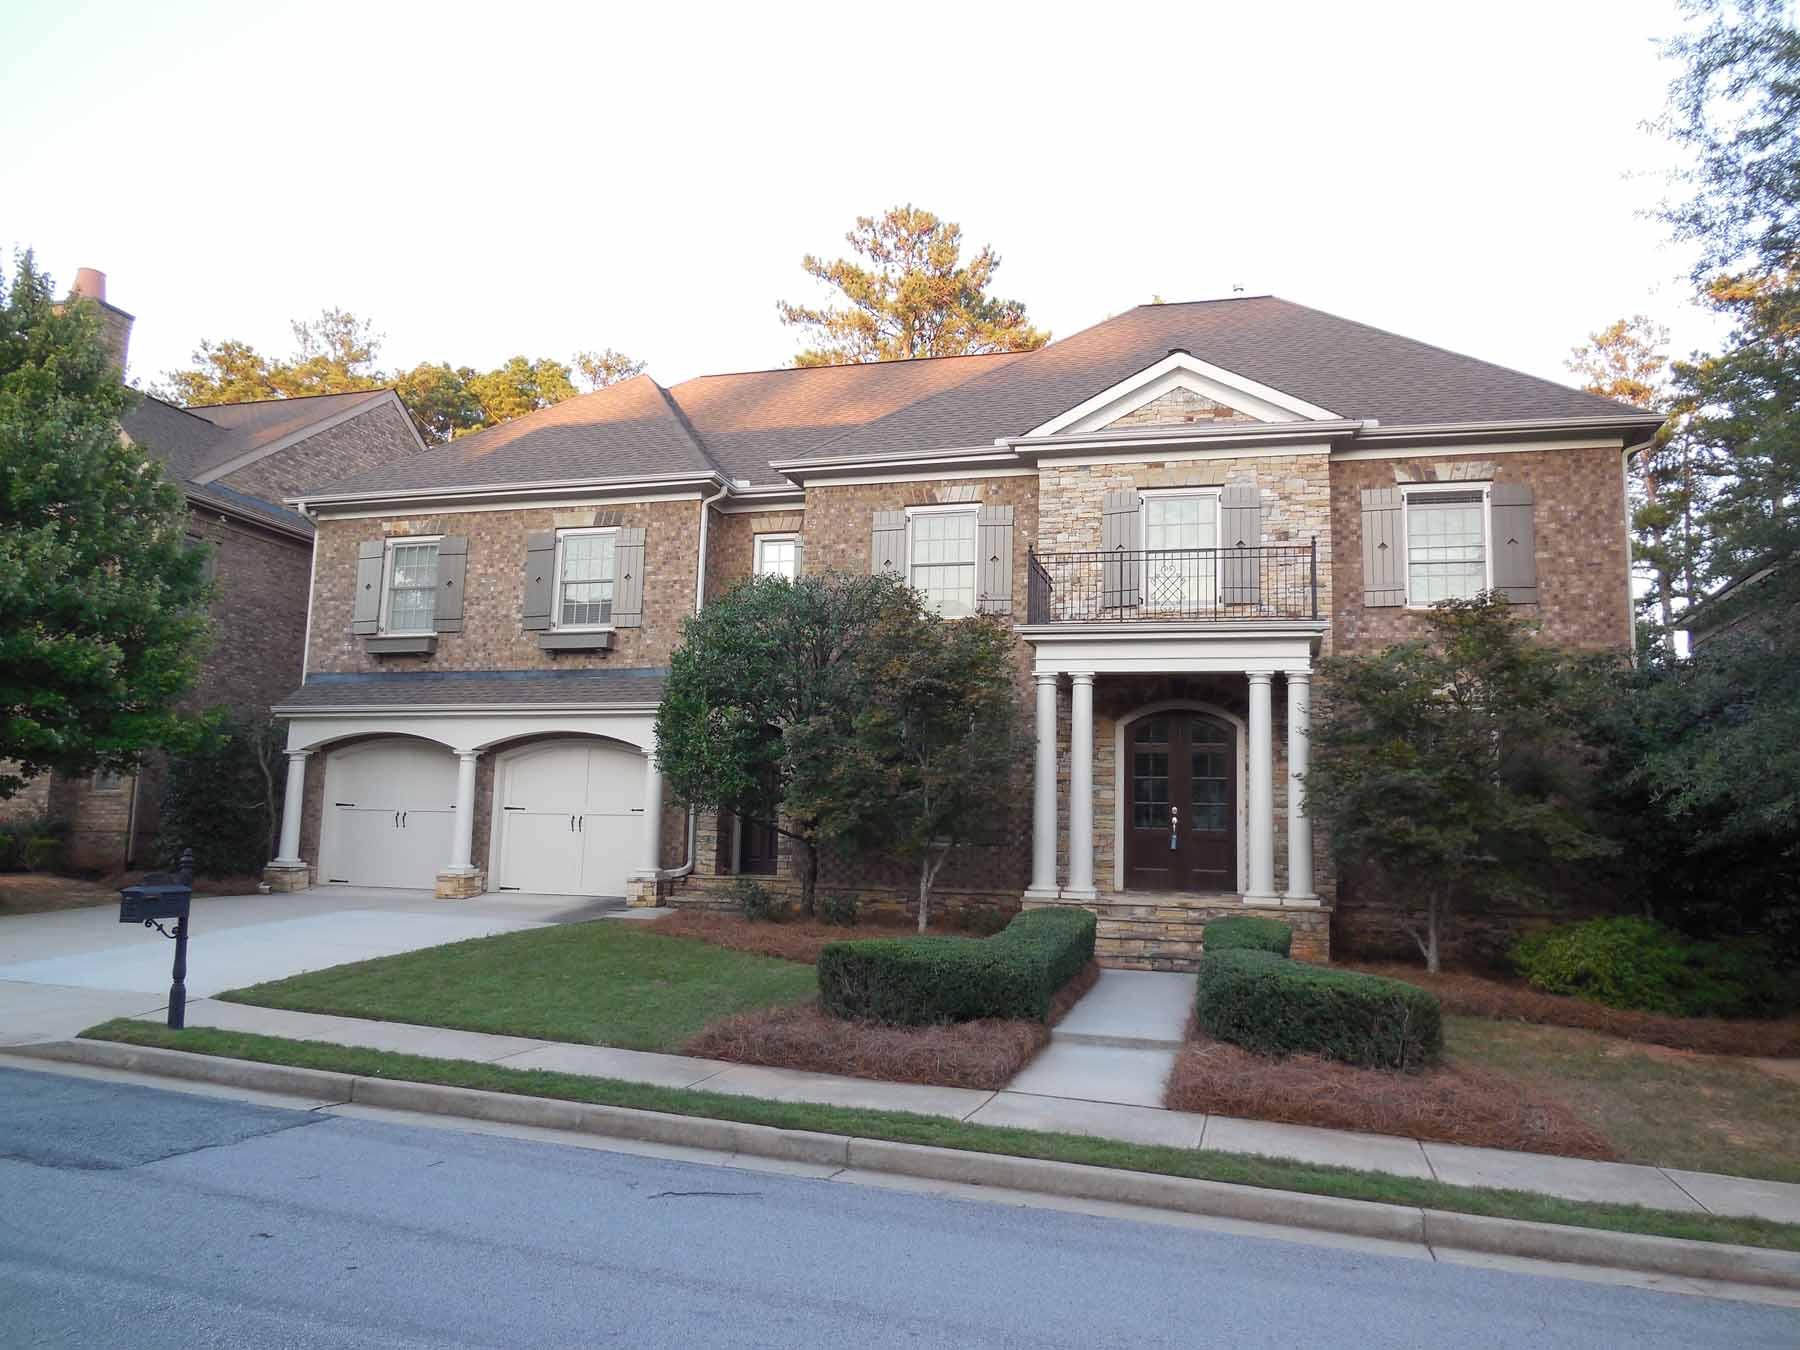 獨棟家庭住宅 為 出售 在 Gorgeous Brick and Stone Home in Weston 7870 Georgetown Circle Suwanee, 喬治亞州, 30024 美國